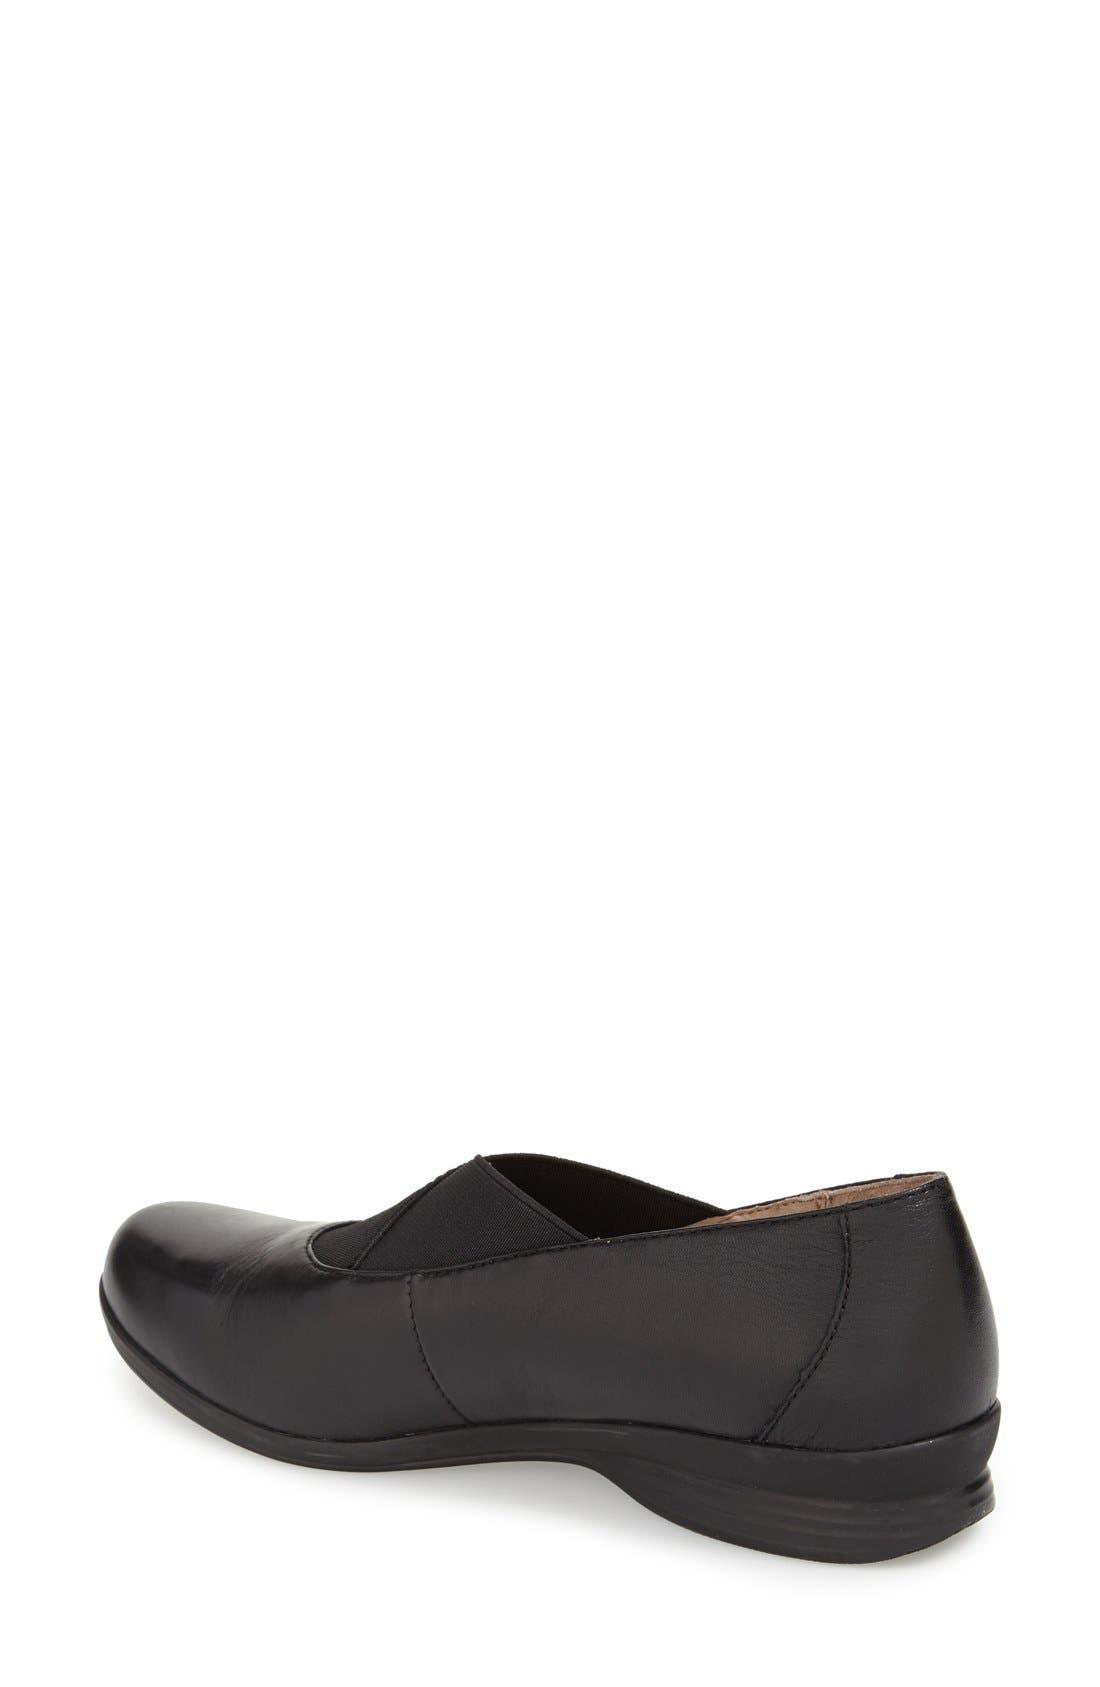 Alternate Image 2  - Dansko 'Ann' Round Toe Flat (Women)